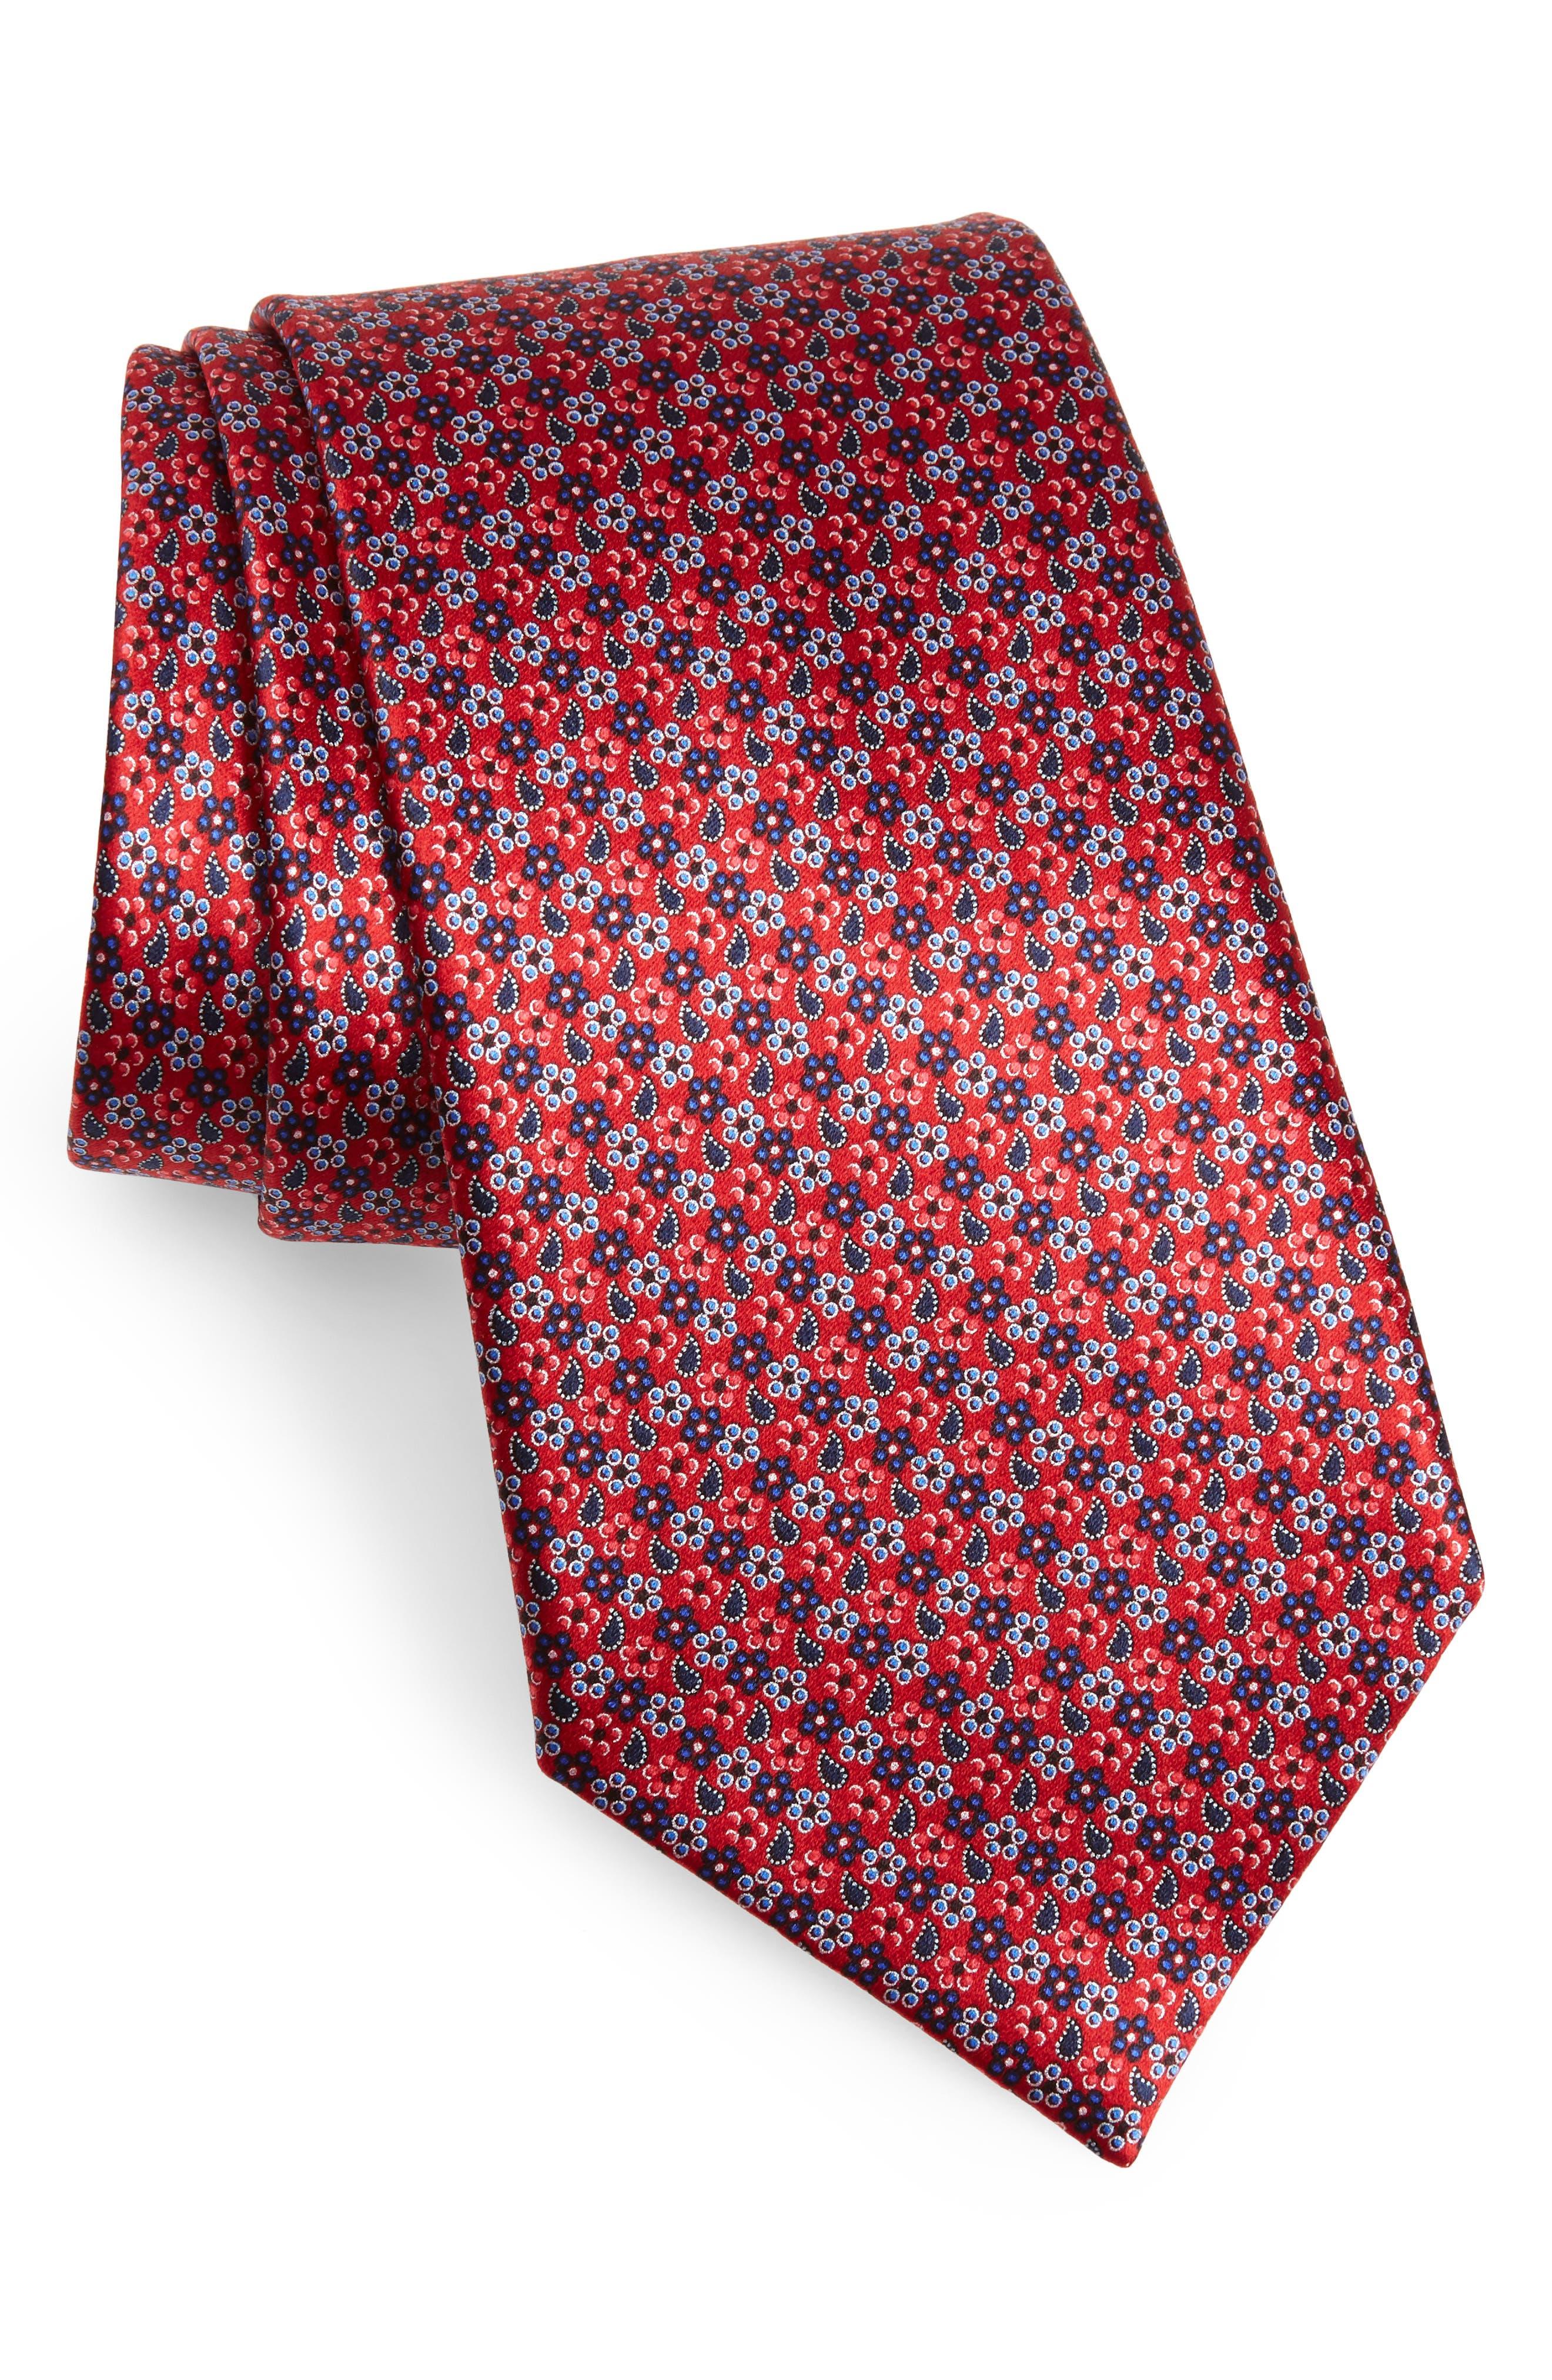 ERMENEGILDO ZEGNA, Microfloral Silk Tie, Main thumbnail 1, color, 618